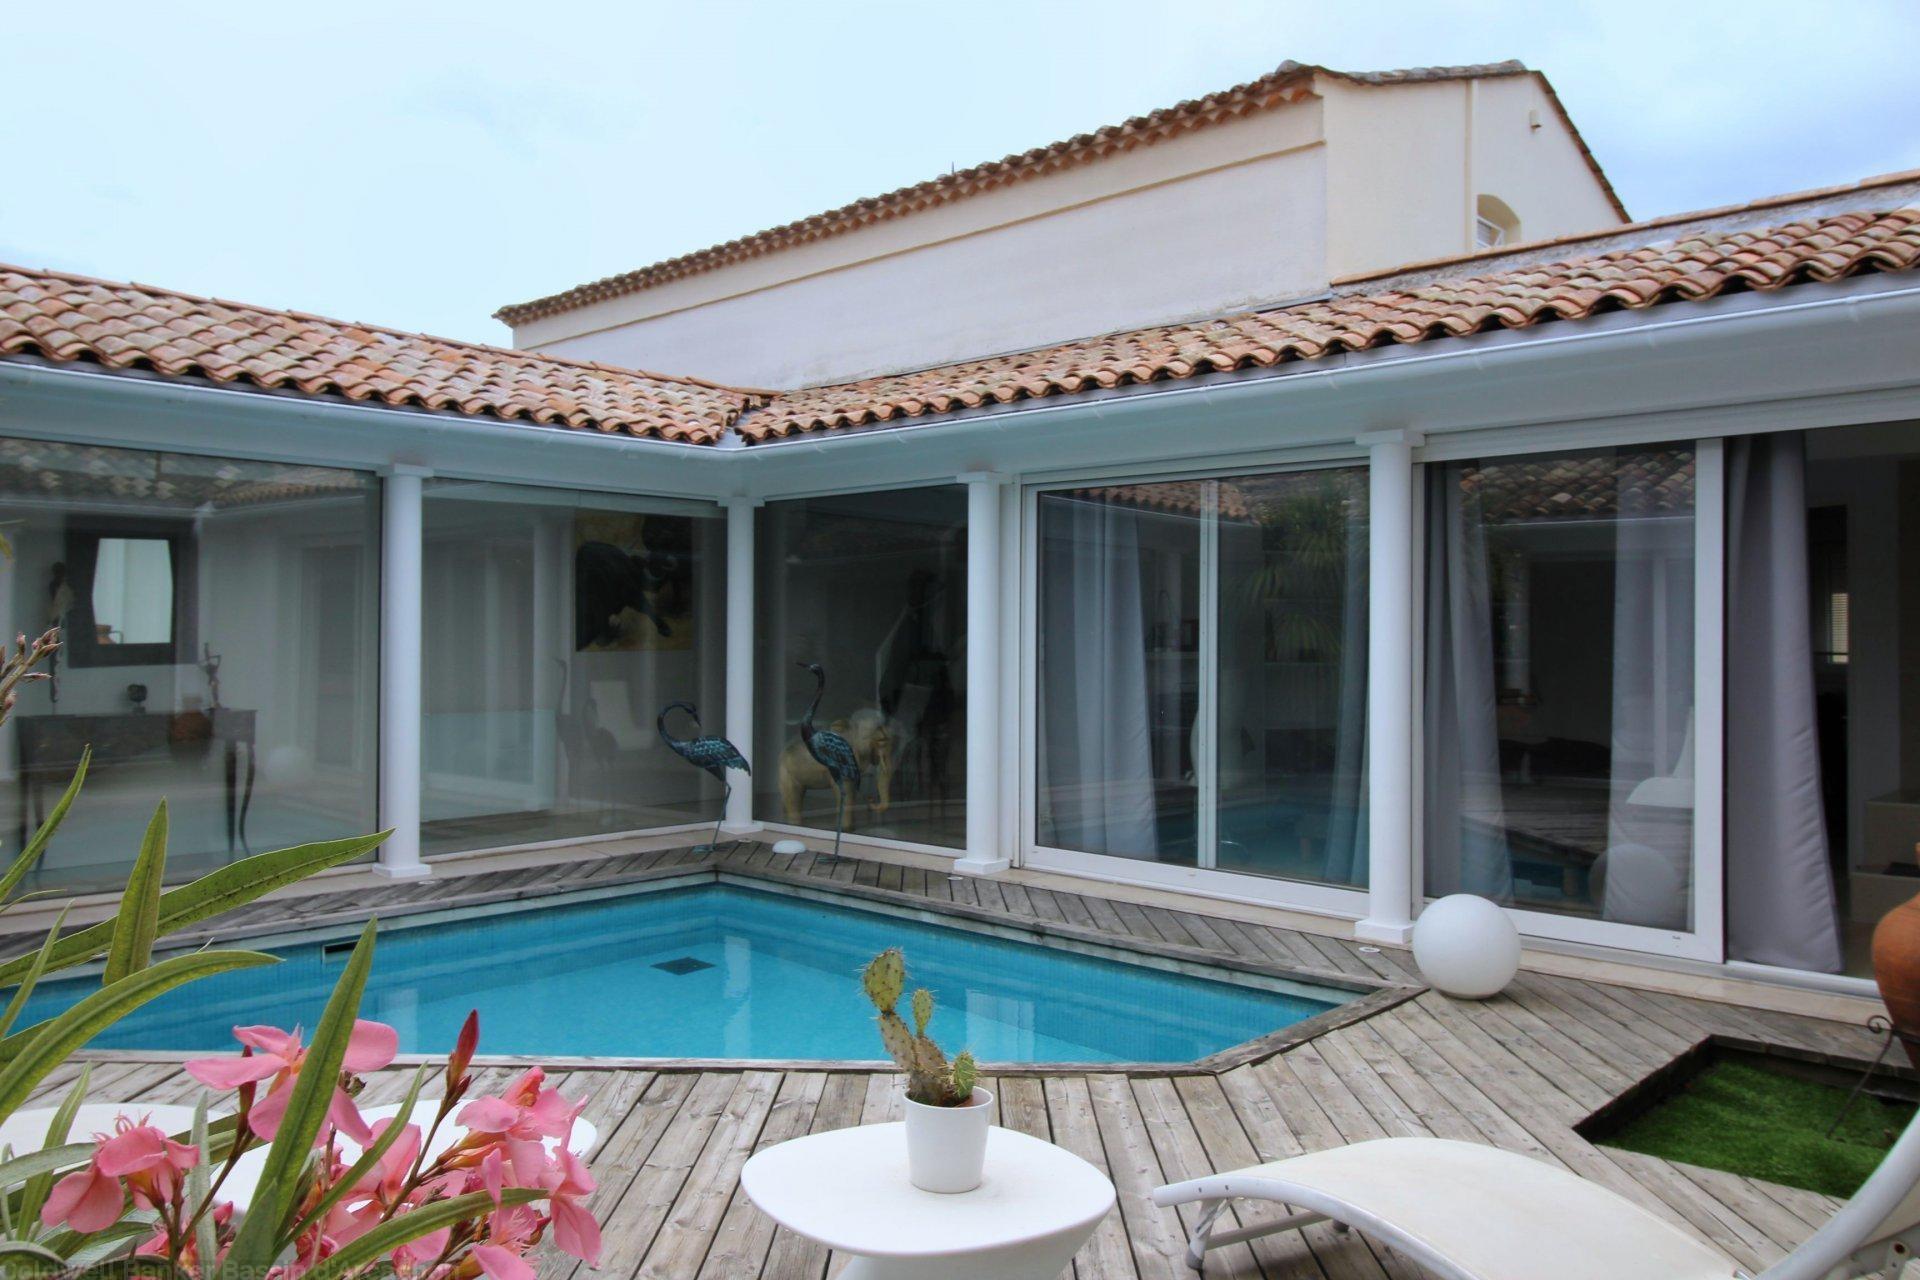 vente maison villa bordeaux caud ran 4 chambres coldwell banker. Black Bedroom Furniture Sets. Home Design Ideas